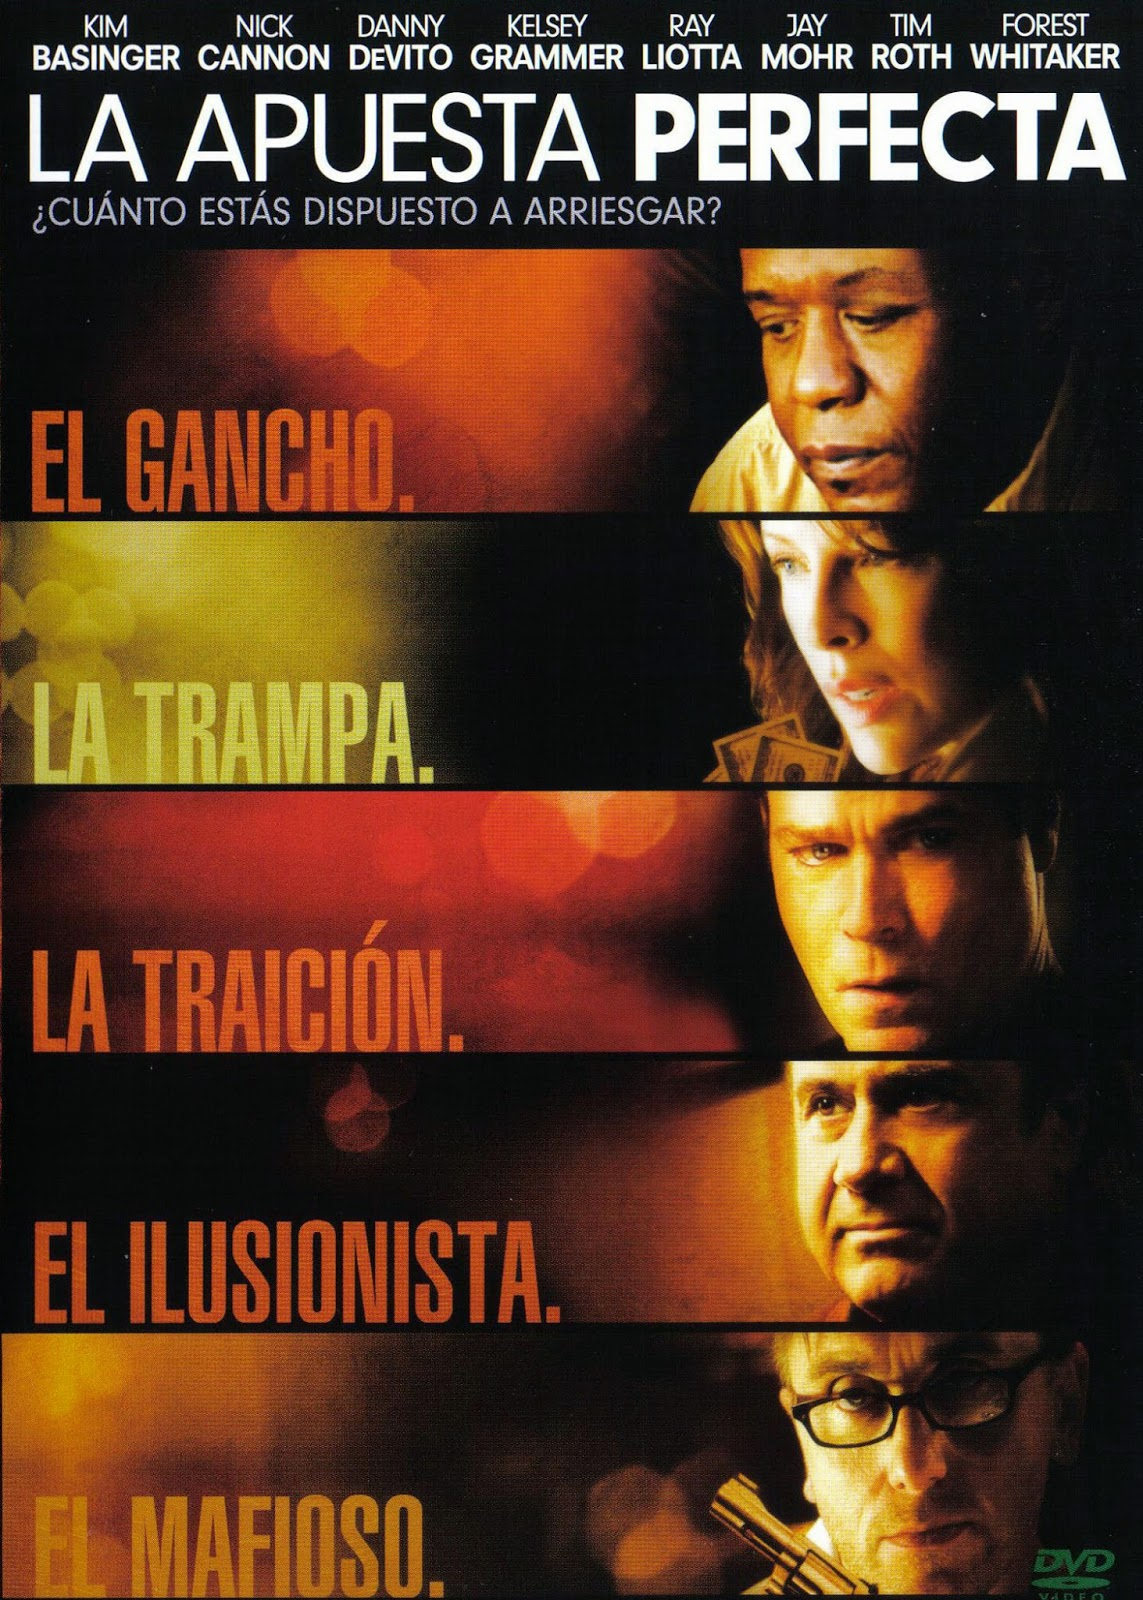 La Apuesta Perfecta (2006)